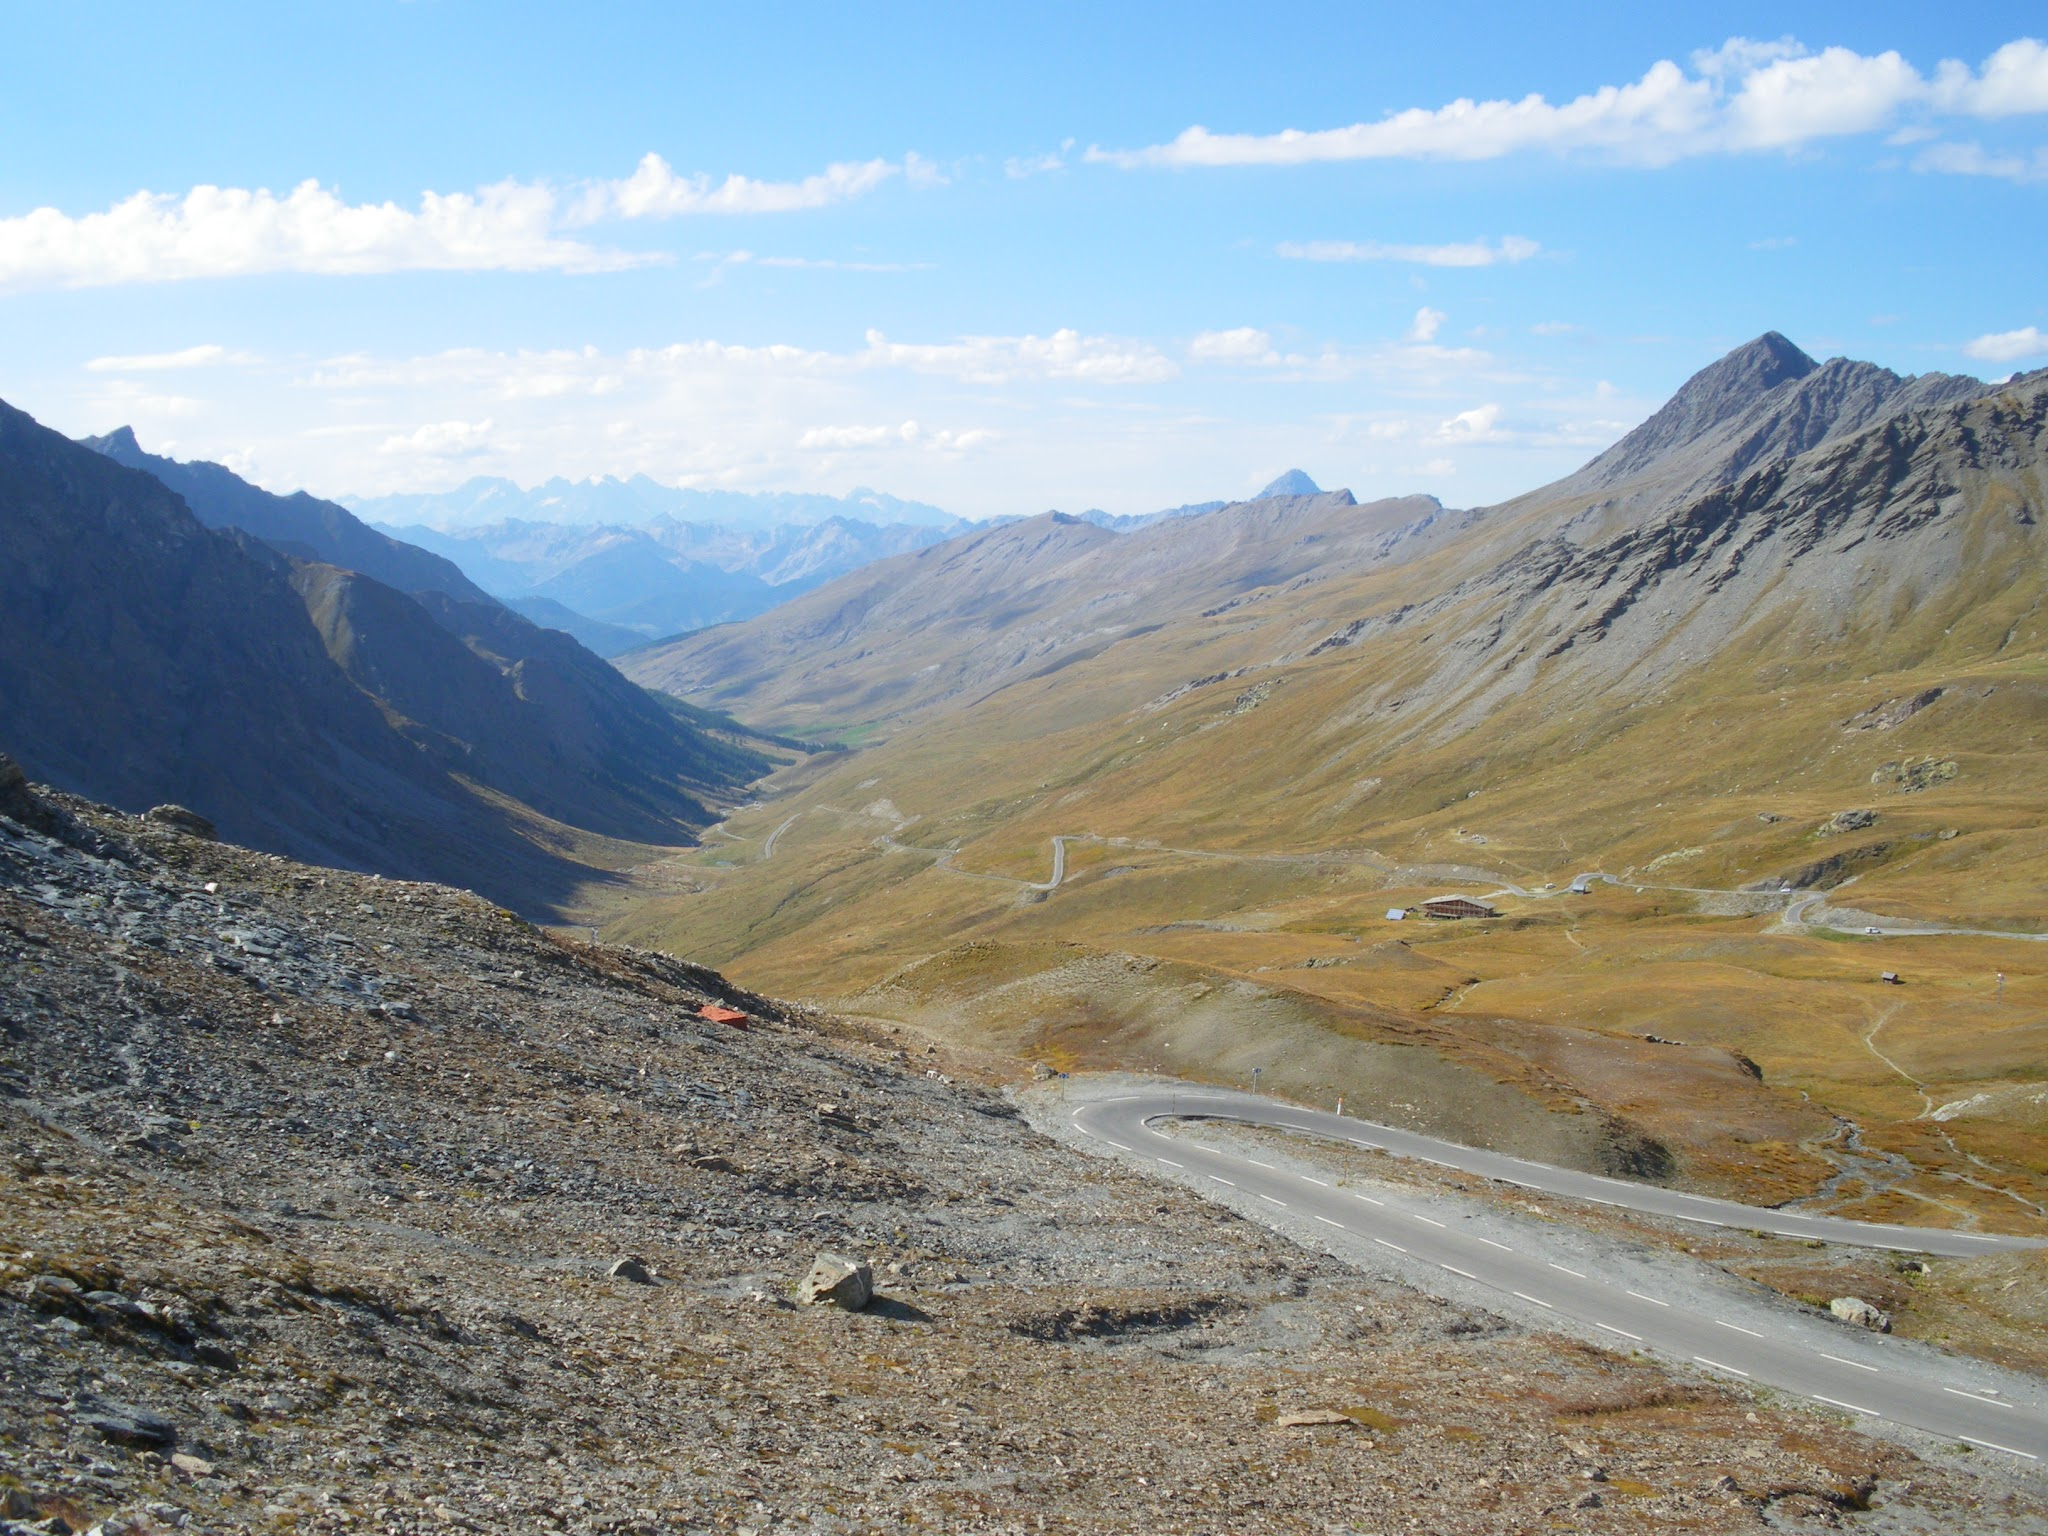 Parc natural del Queyras, Hautes Alpes, Alps francesos, Piemonte, Alps italians, senderisme